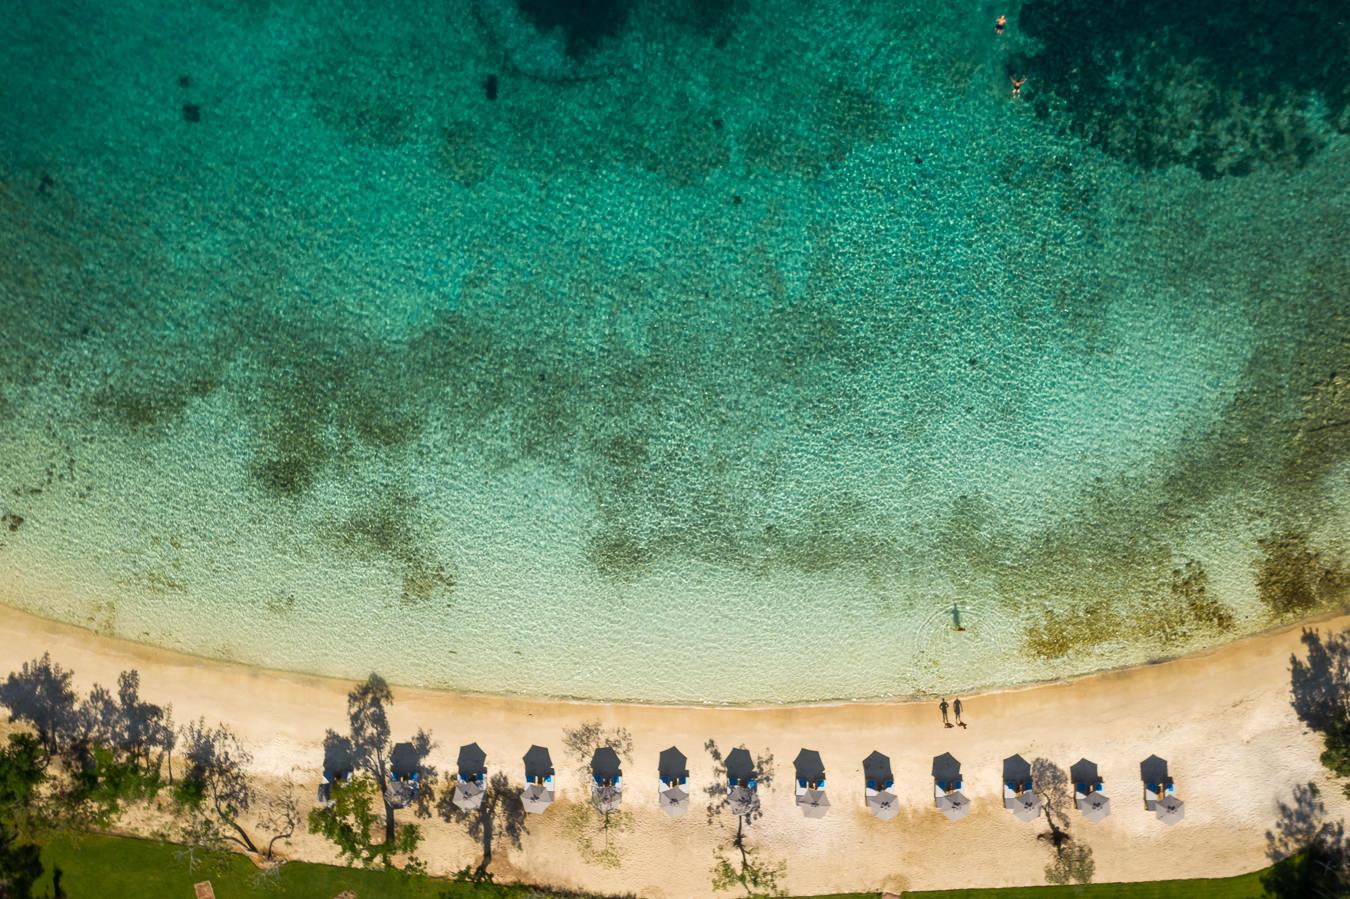 Vathi Cove Resort & Spa, Thasos, Γιώργος Φάκαρος - Αρχιτεκτονική Φωτογραφία | Εσωτερικοί Χώροι | Φωτογραφία Ξενοδοχειών - Photography / Φωτογραφία